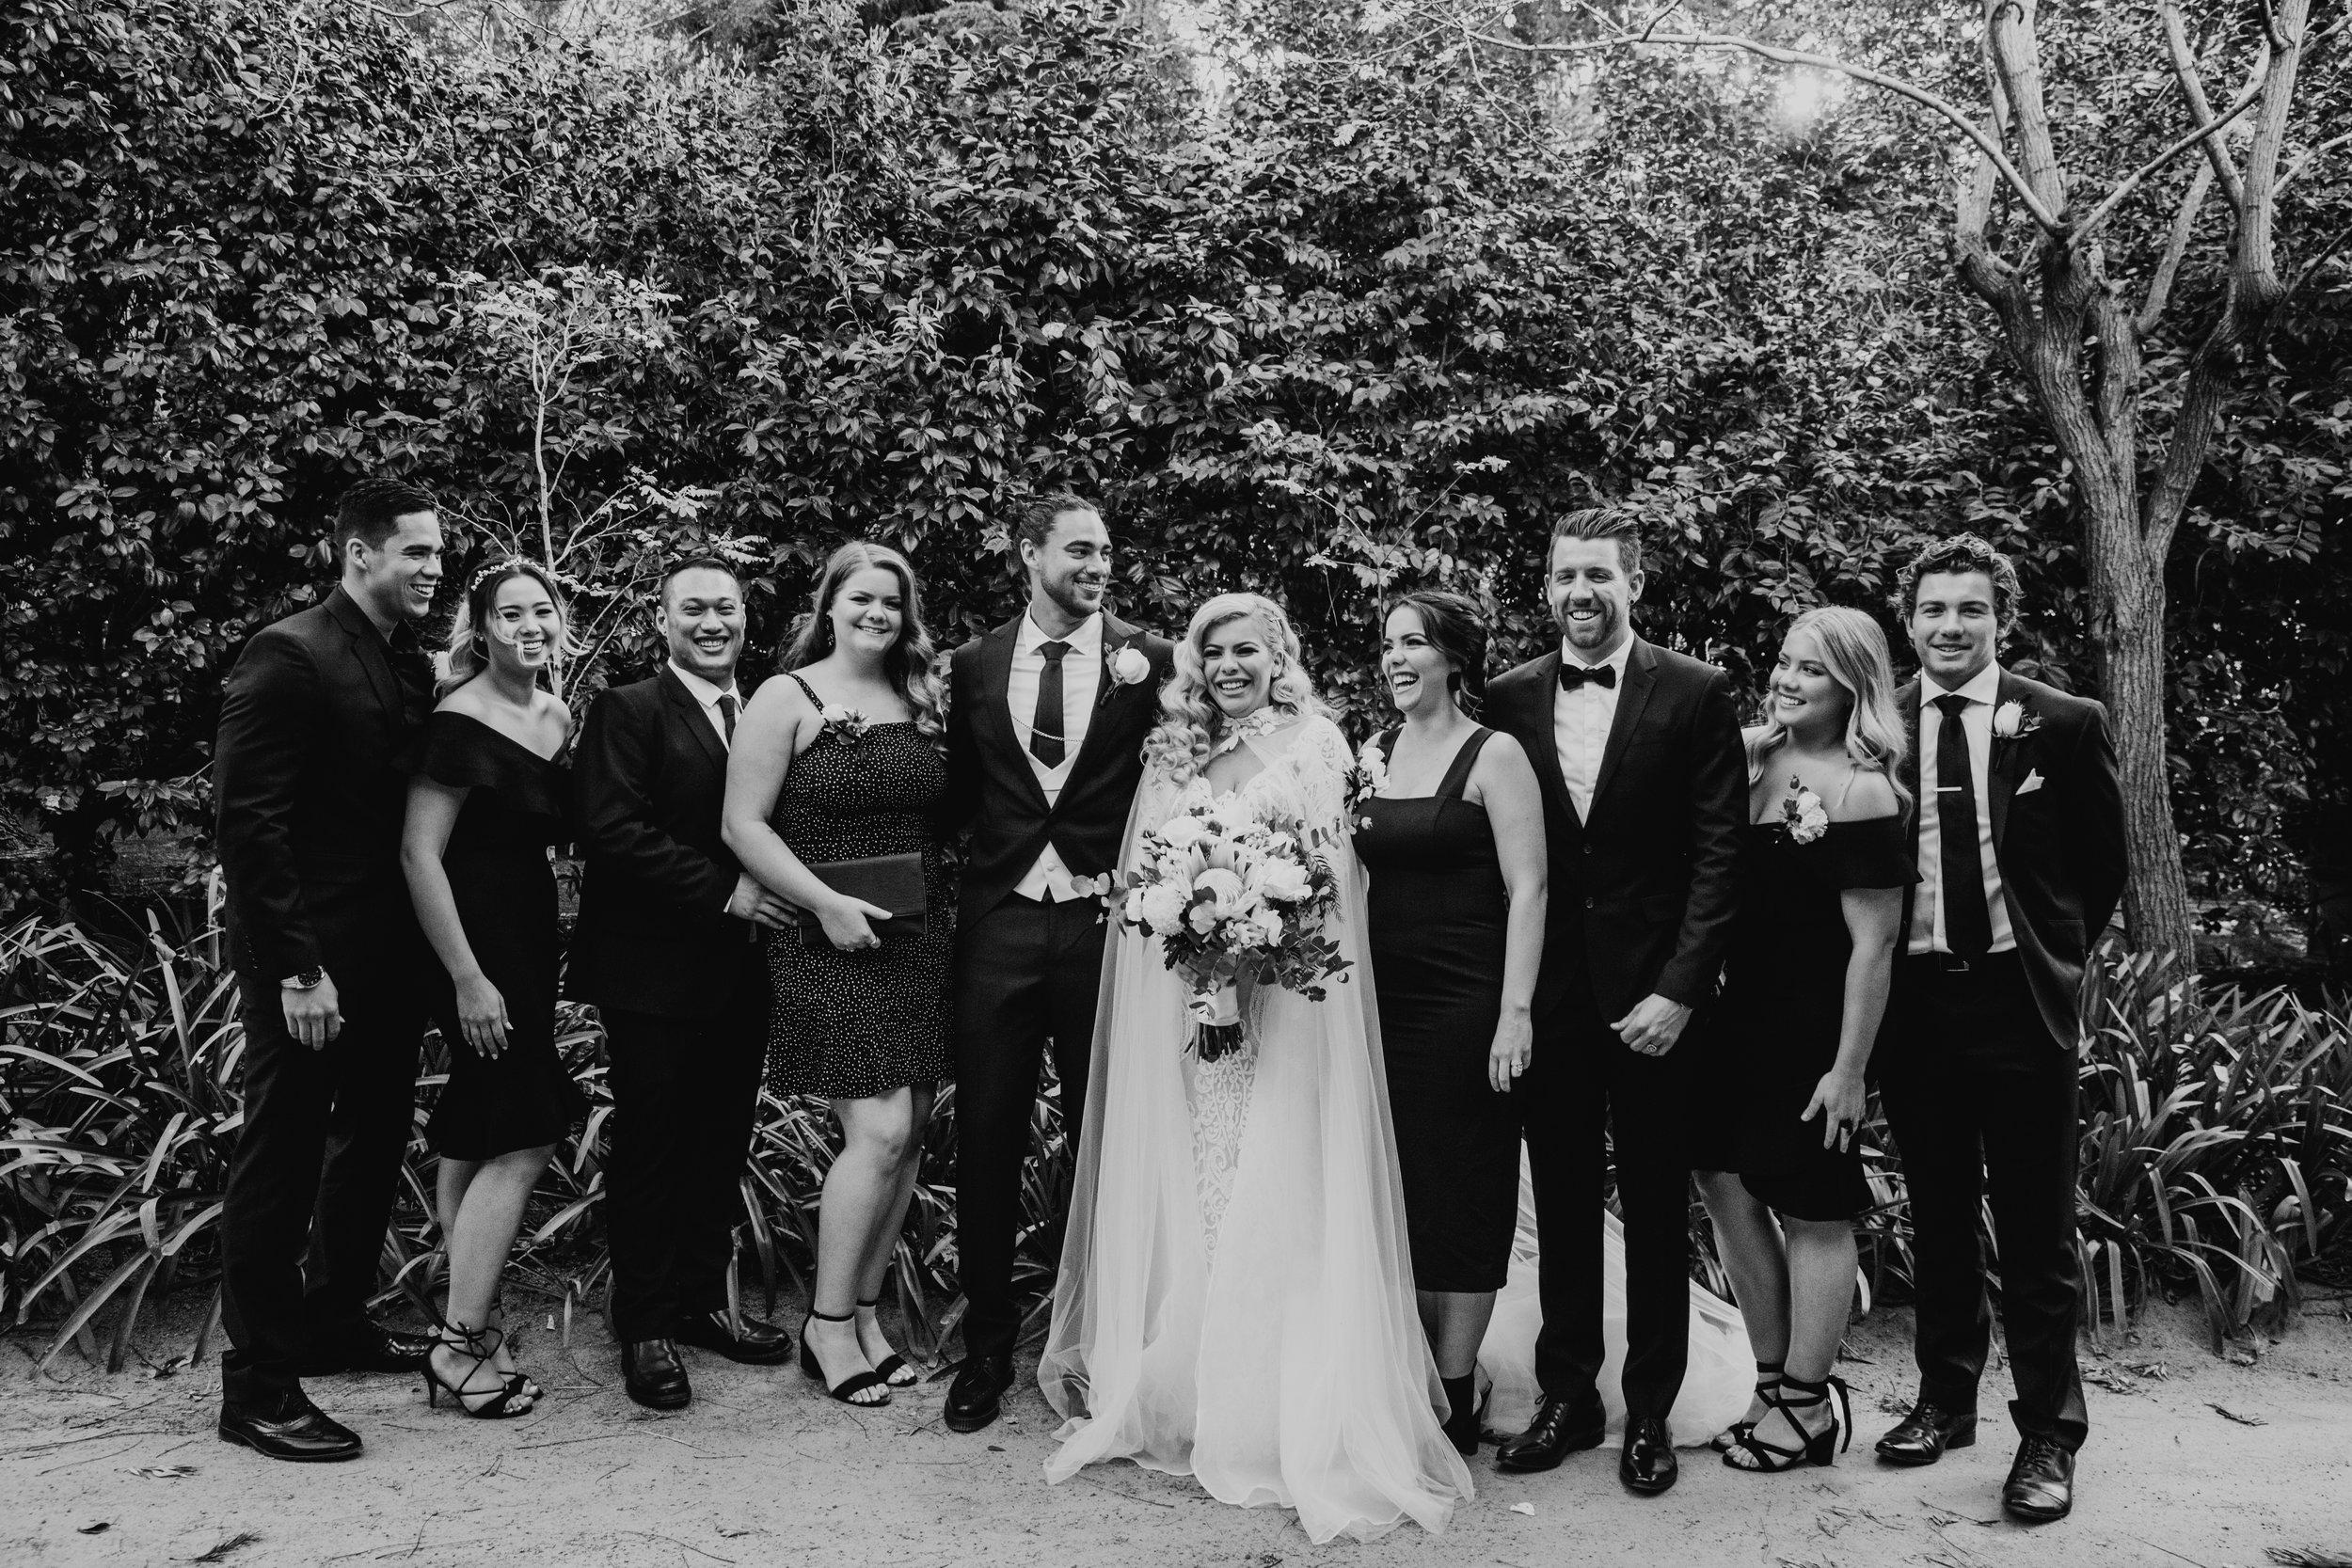 jandc_wedding-387.jpg